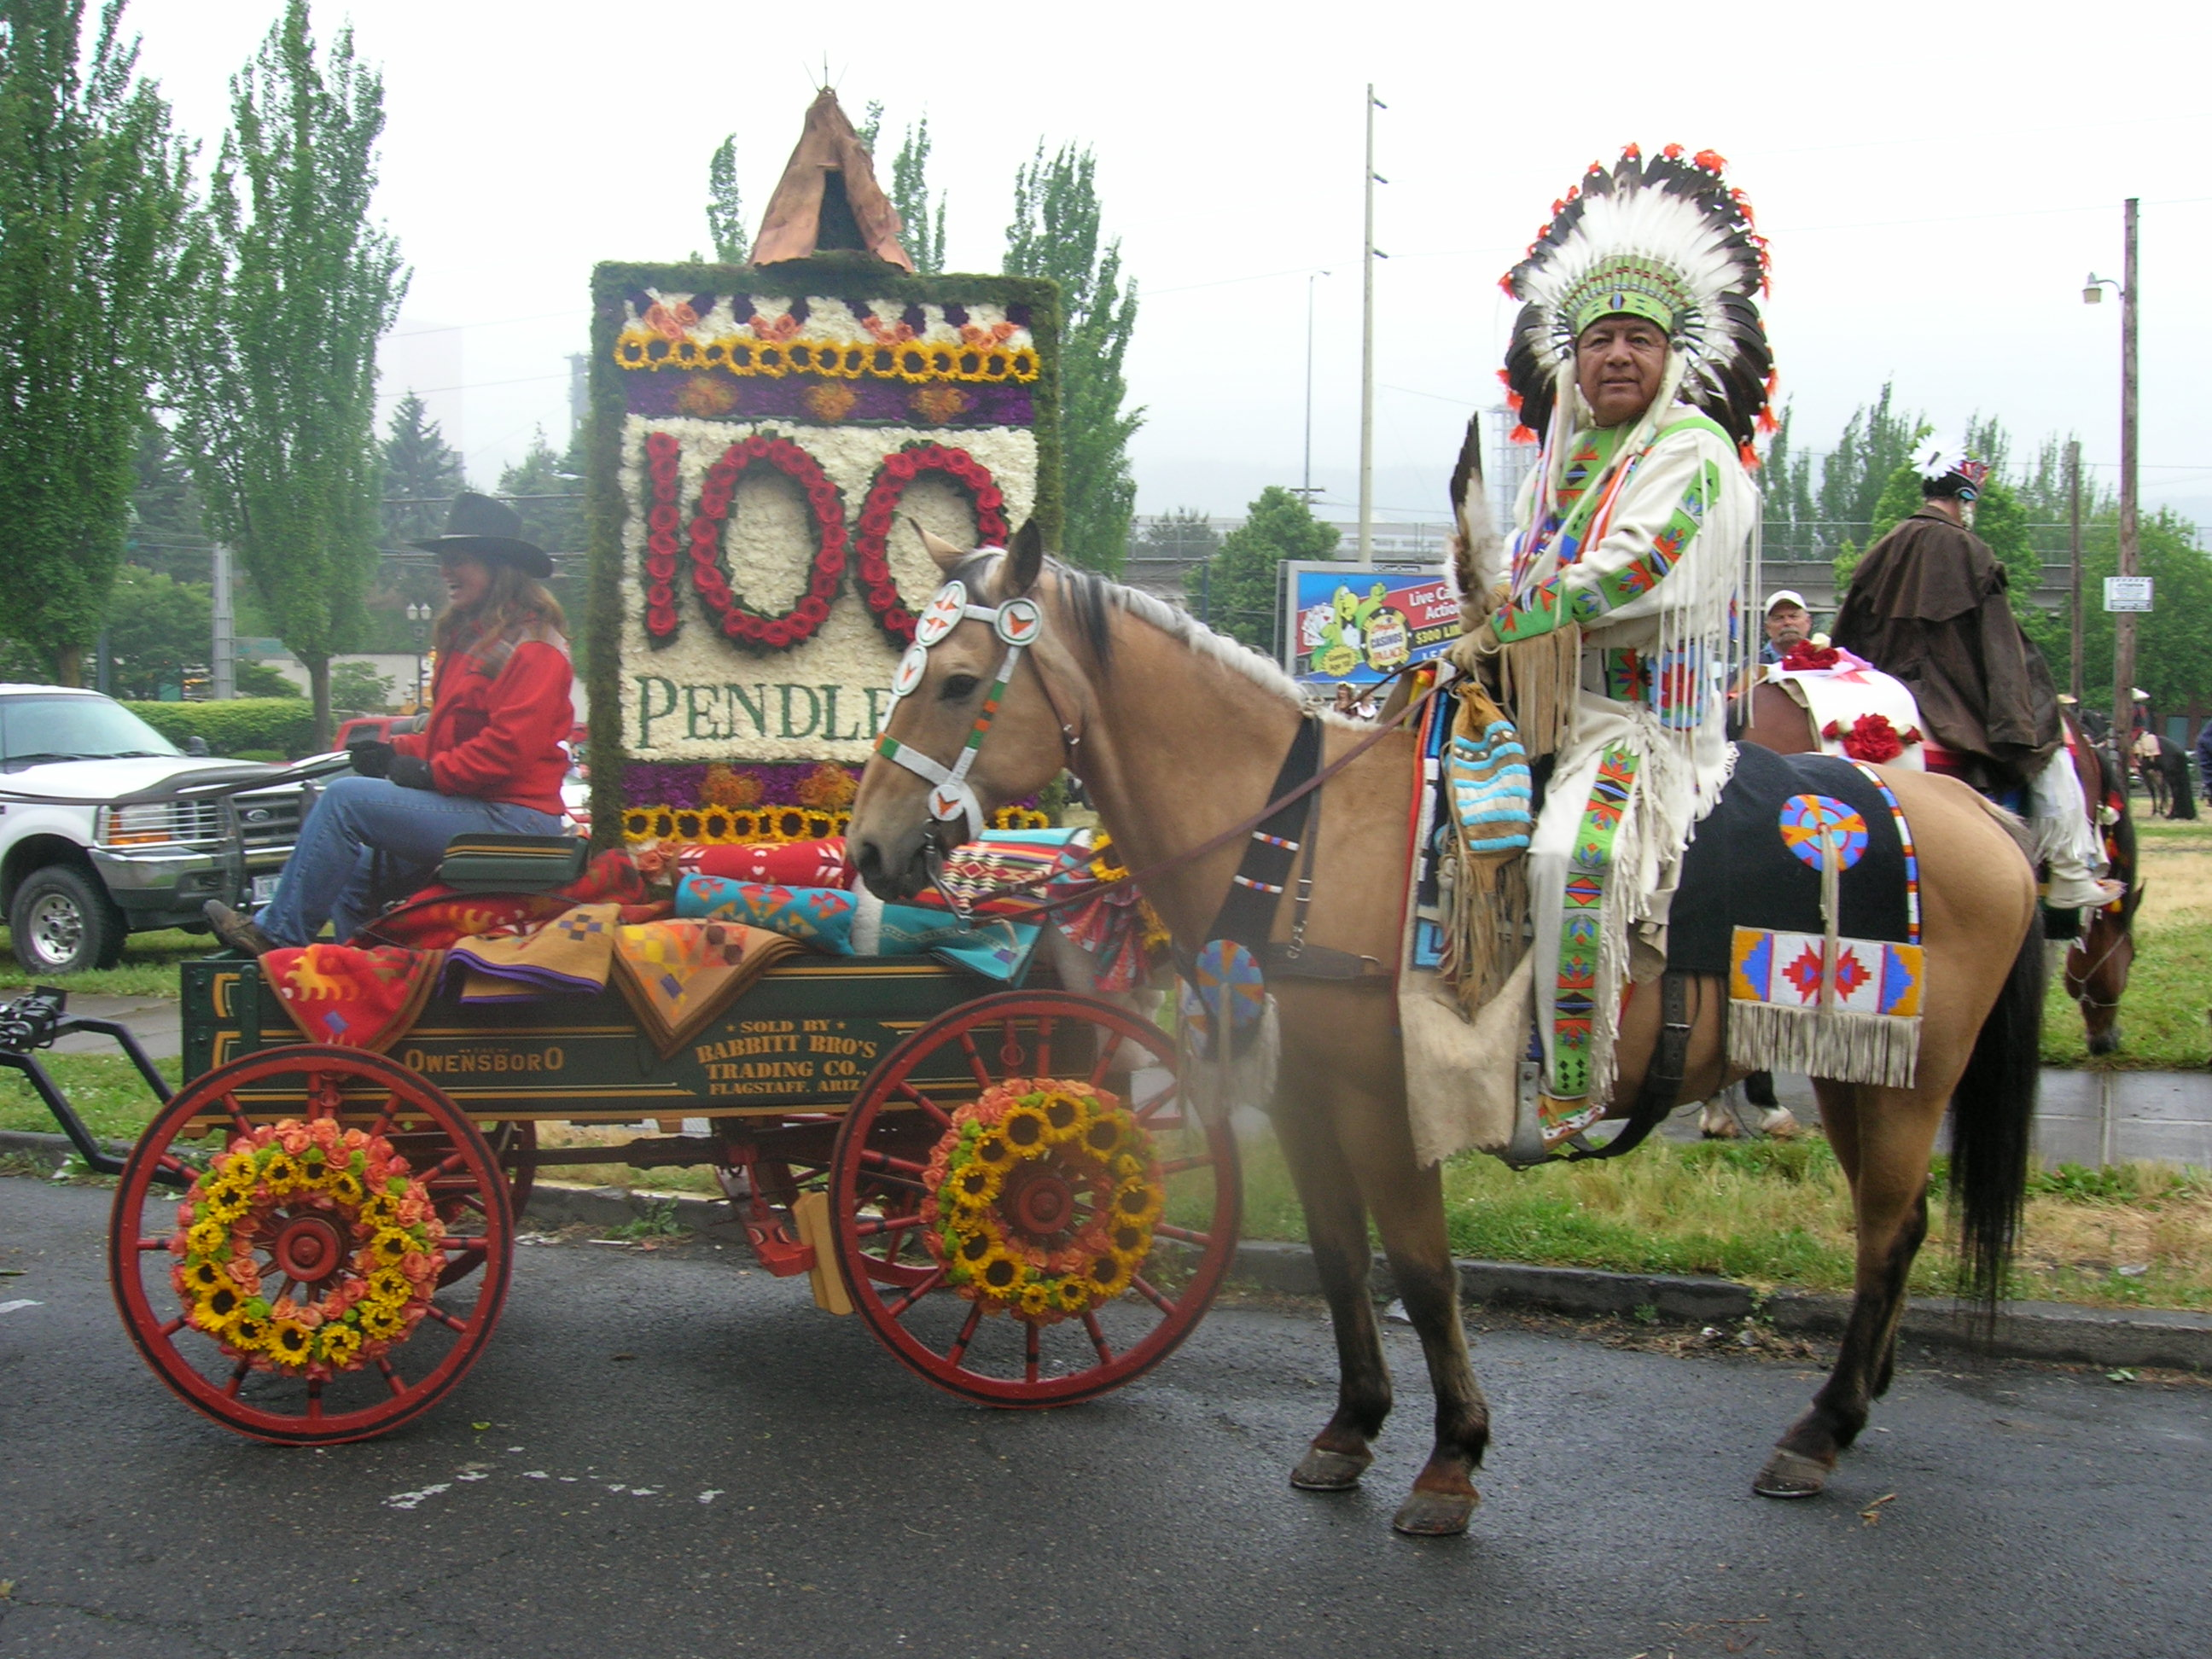 2009 Rose Show , Babbitt wagon with a native American rider alongside